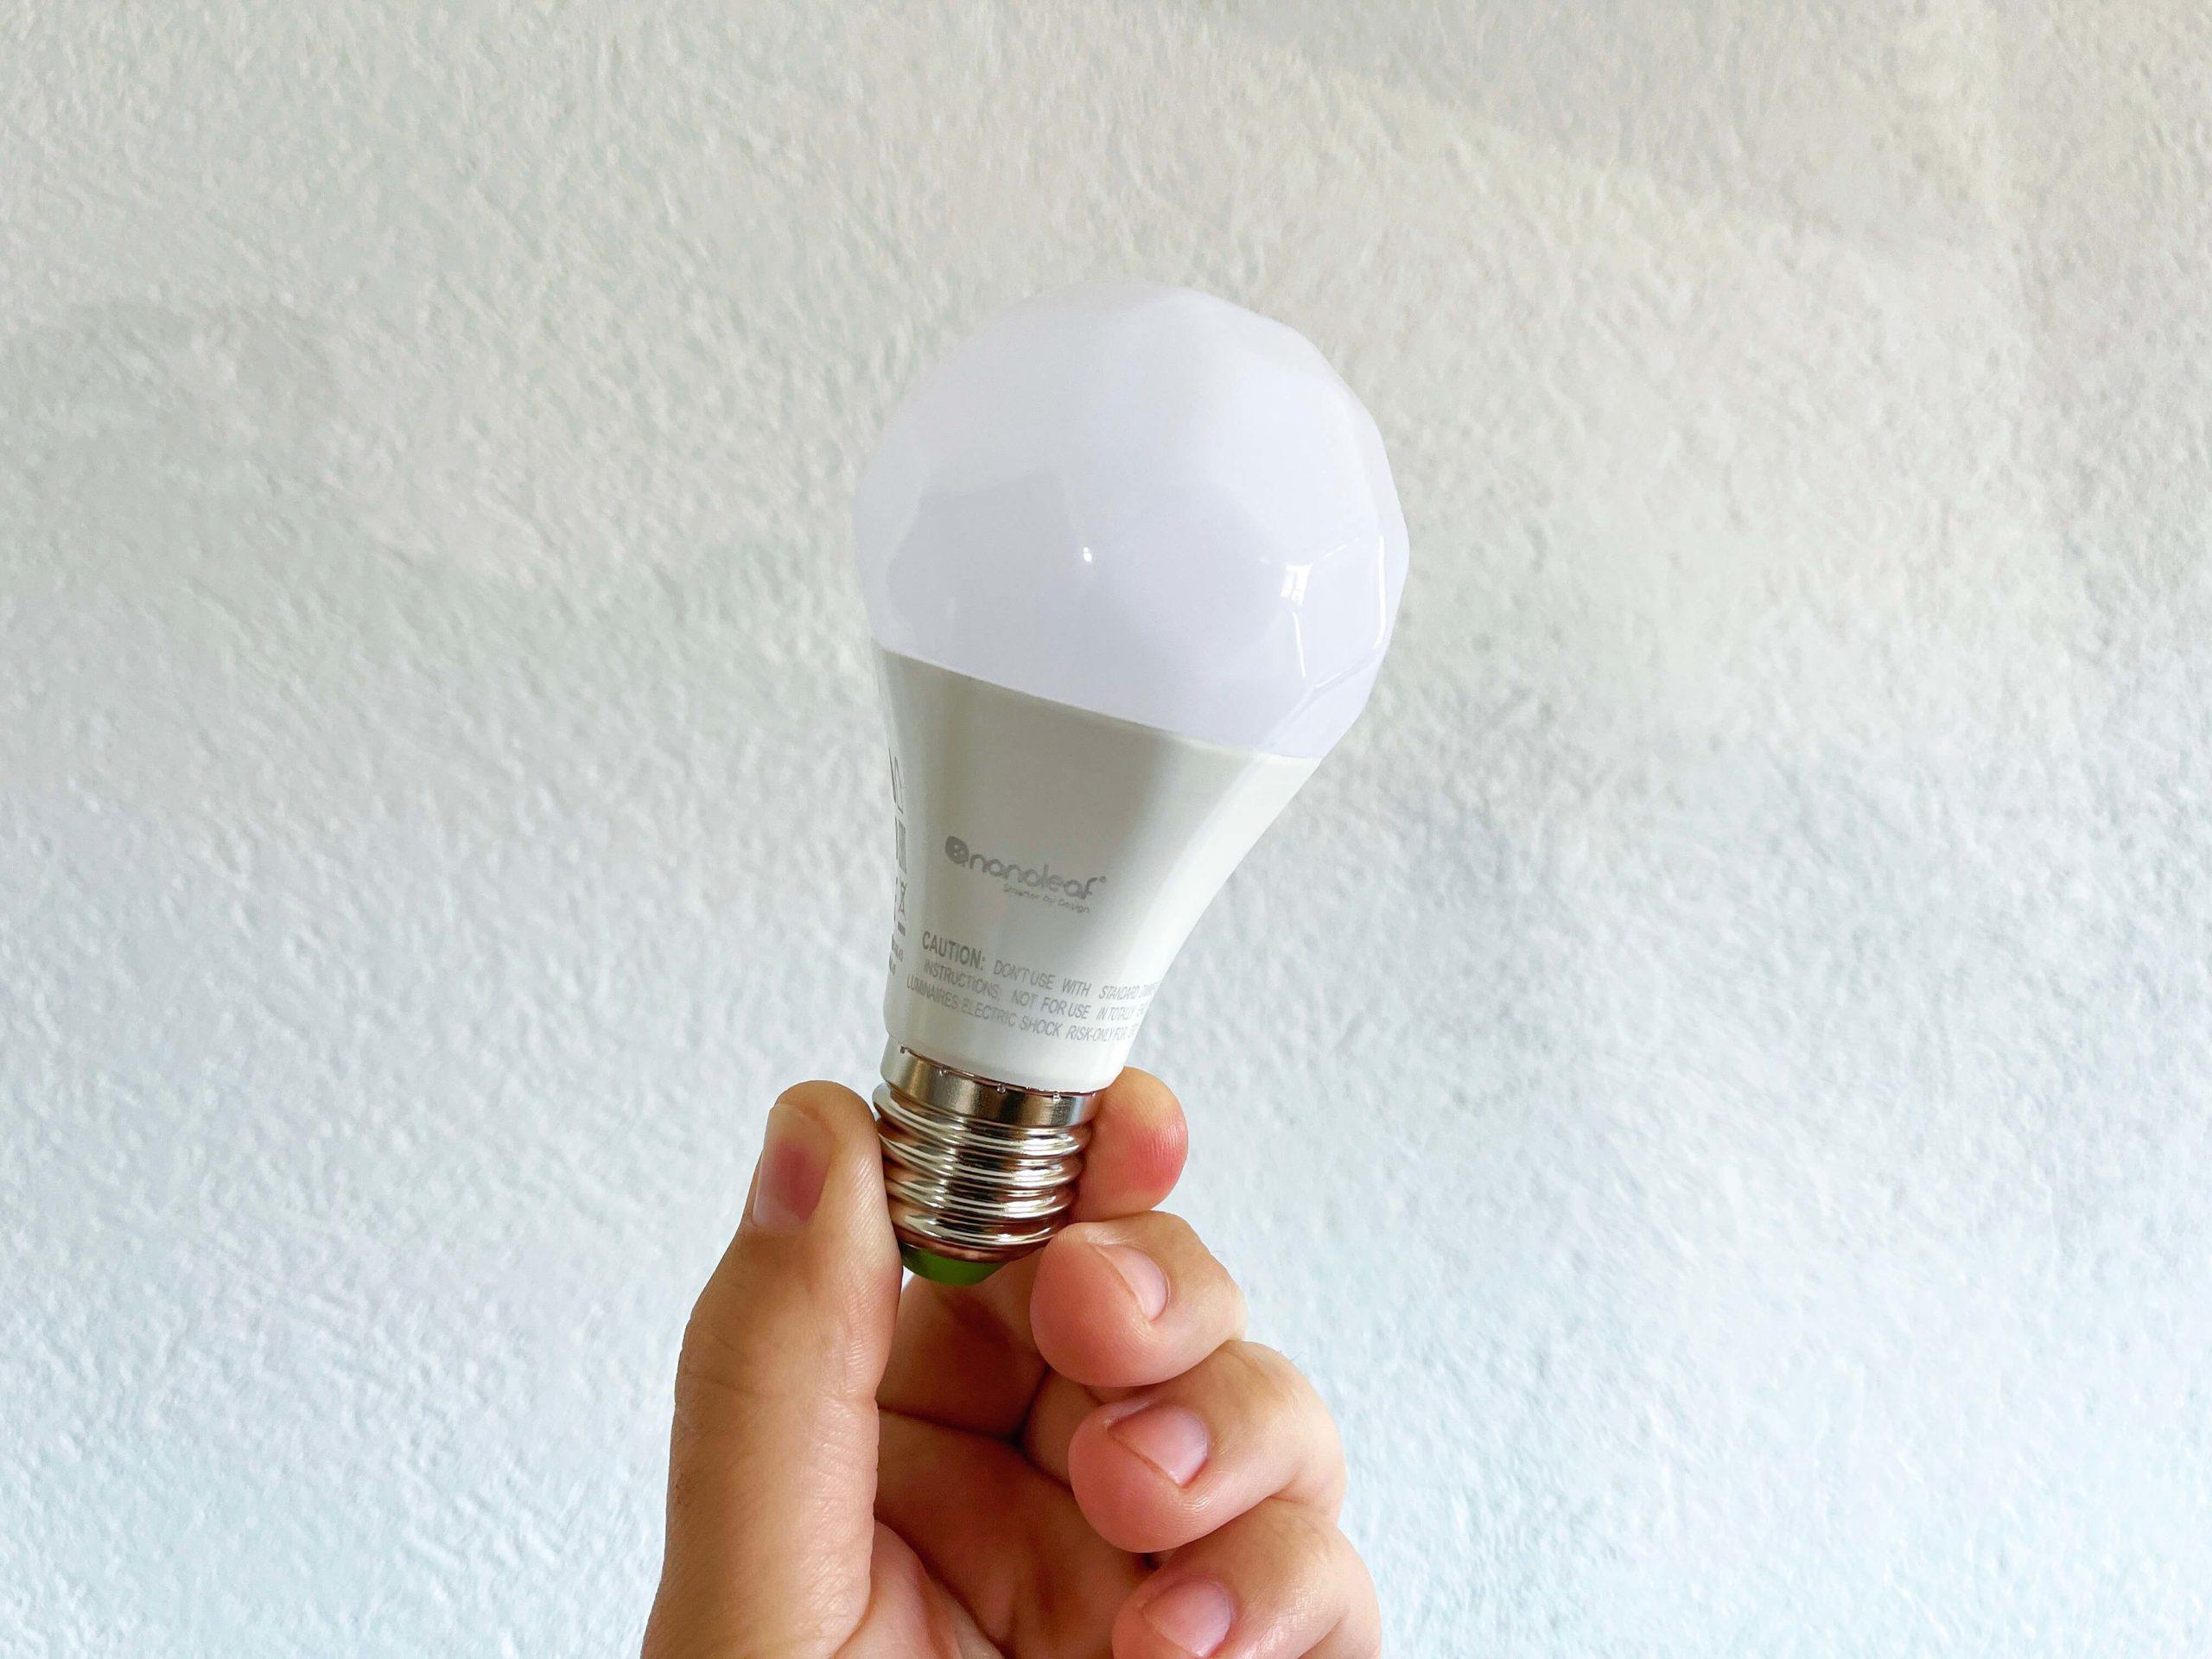 Essentials-E27-LED-Birne-von-Nanoleaf-Apple-HomeKit-Licht-via-Thread3-scaled Essentials E27 LED-Birne von Nanoleaf -  Apple HomeKit-Licht via Thread